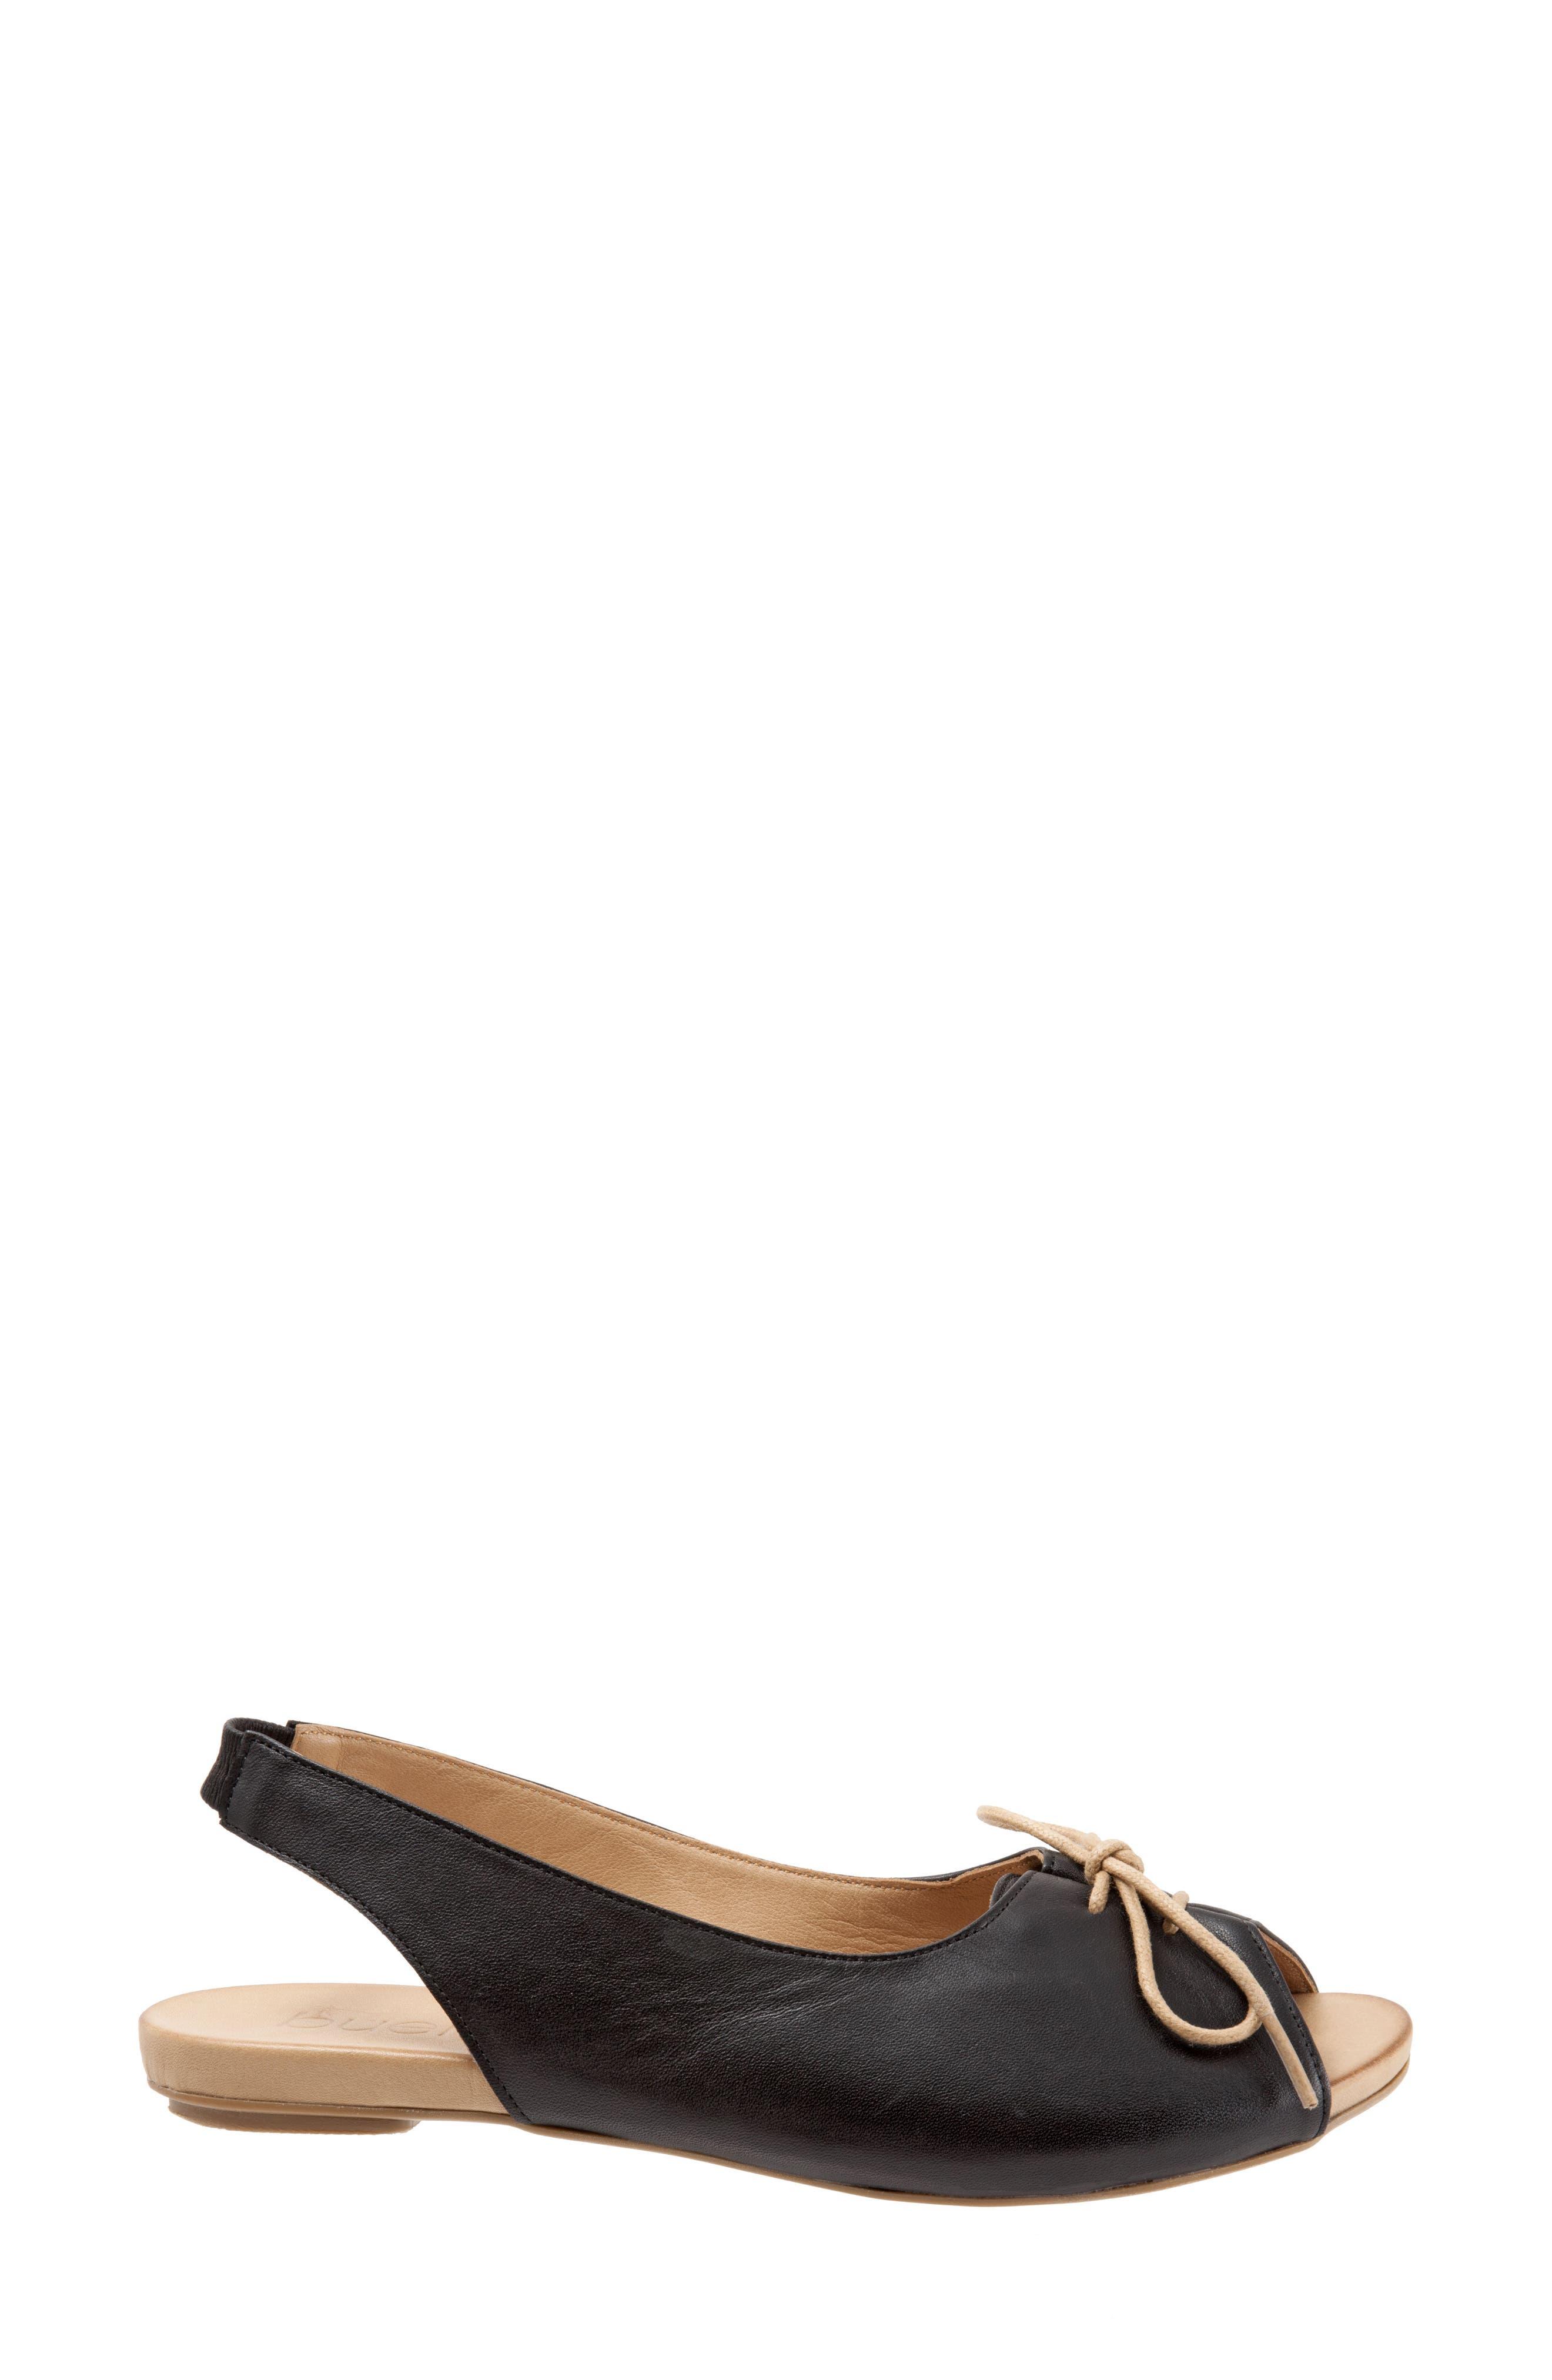 Keely Slingback Tie Sandal,                             Alternate thumbnail 3, color,                             BLACK LEATHER